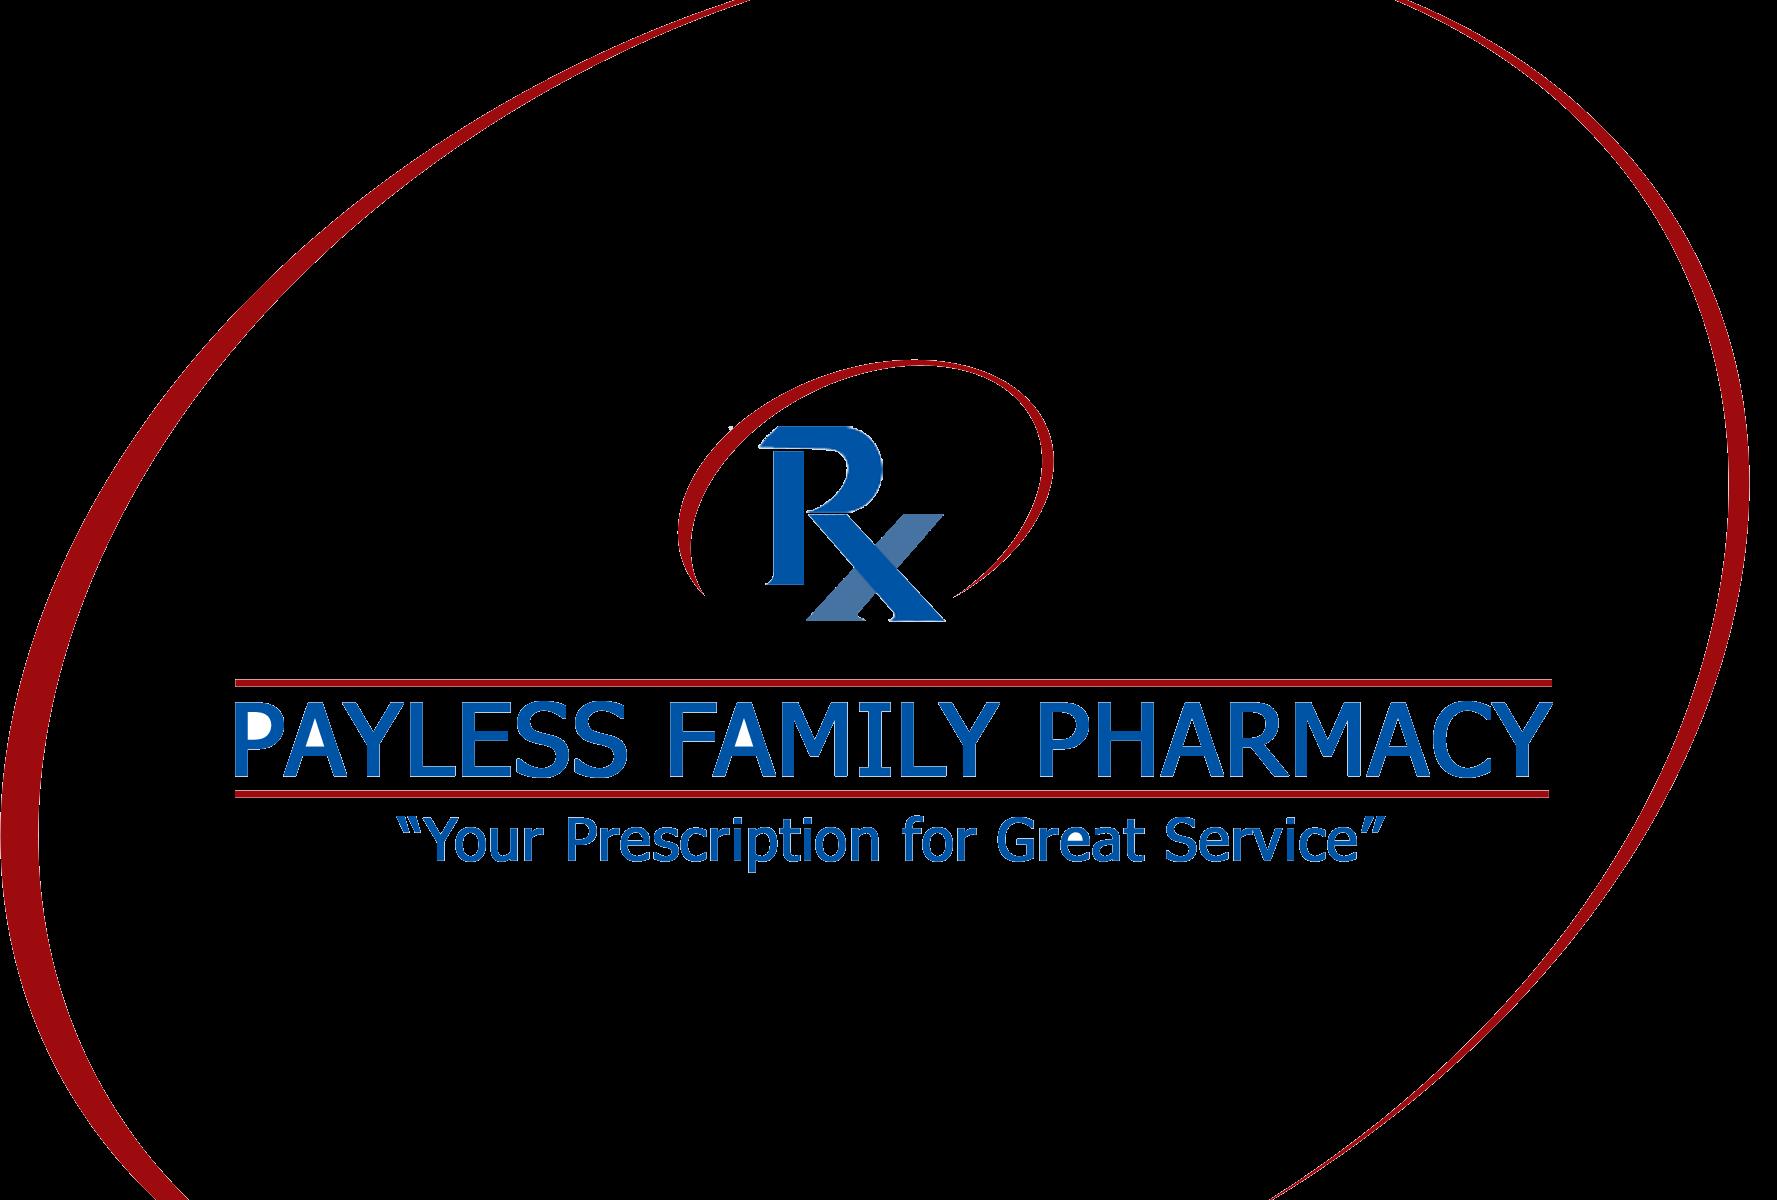 Payless Family Pharmacy